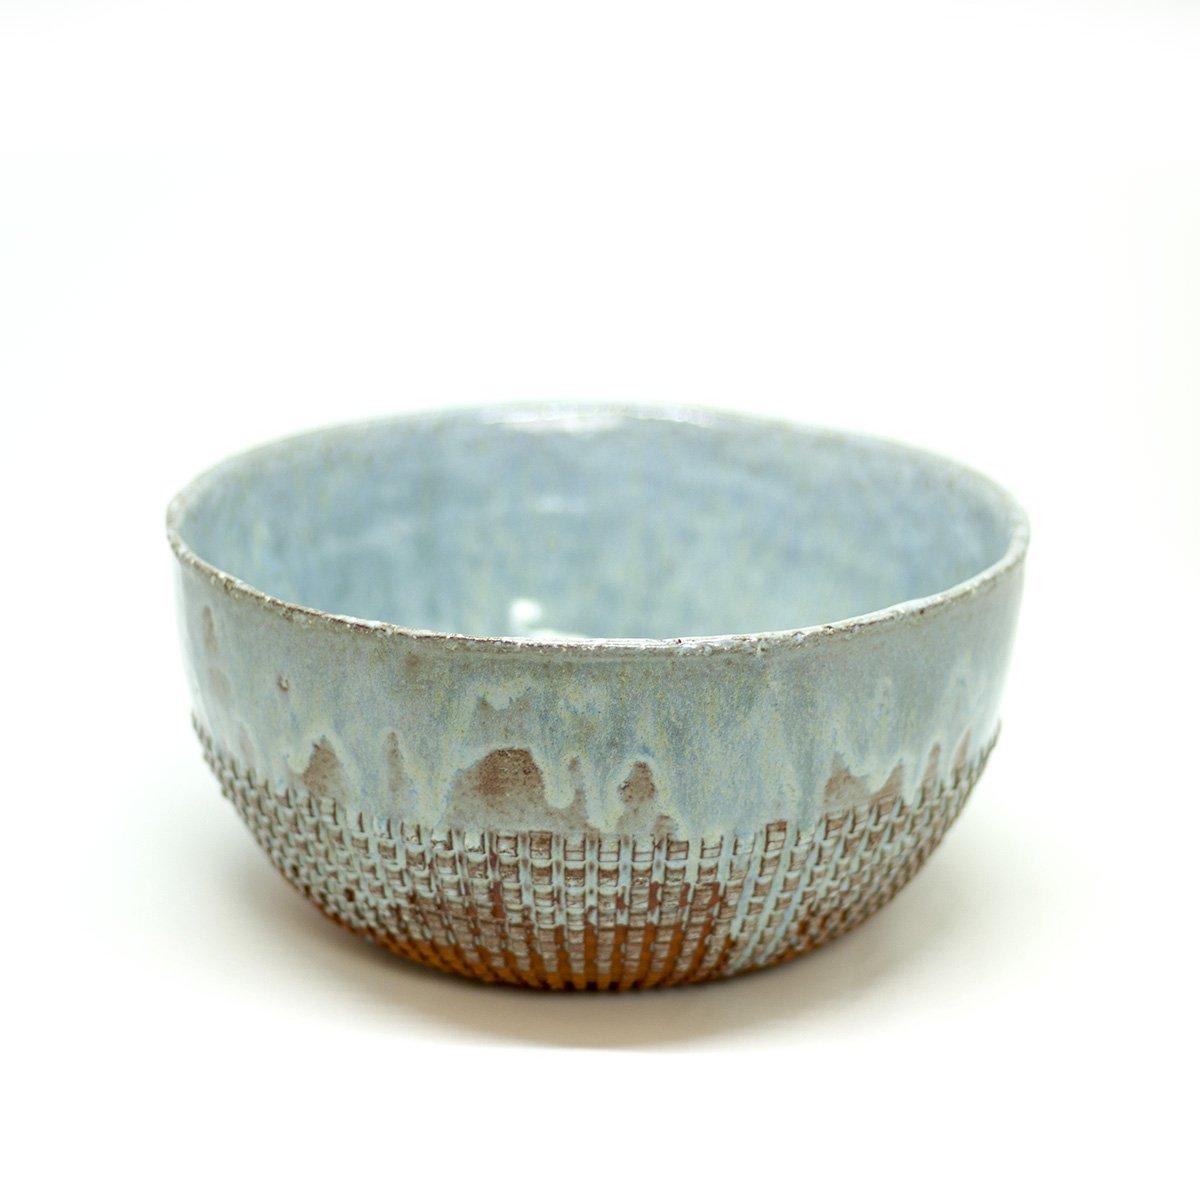 dast kleipers kom blauw keramiek handmade hadngemaakt salad bowl saladekom blue een stip